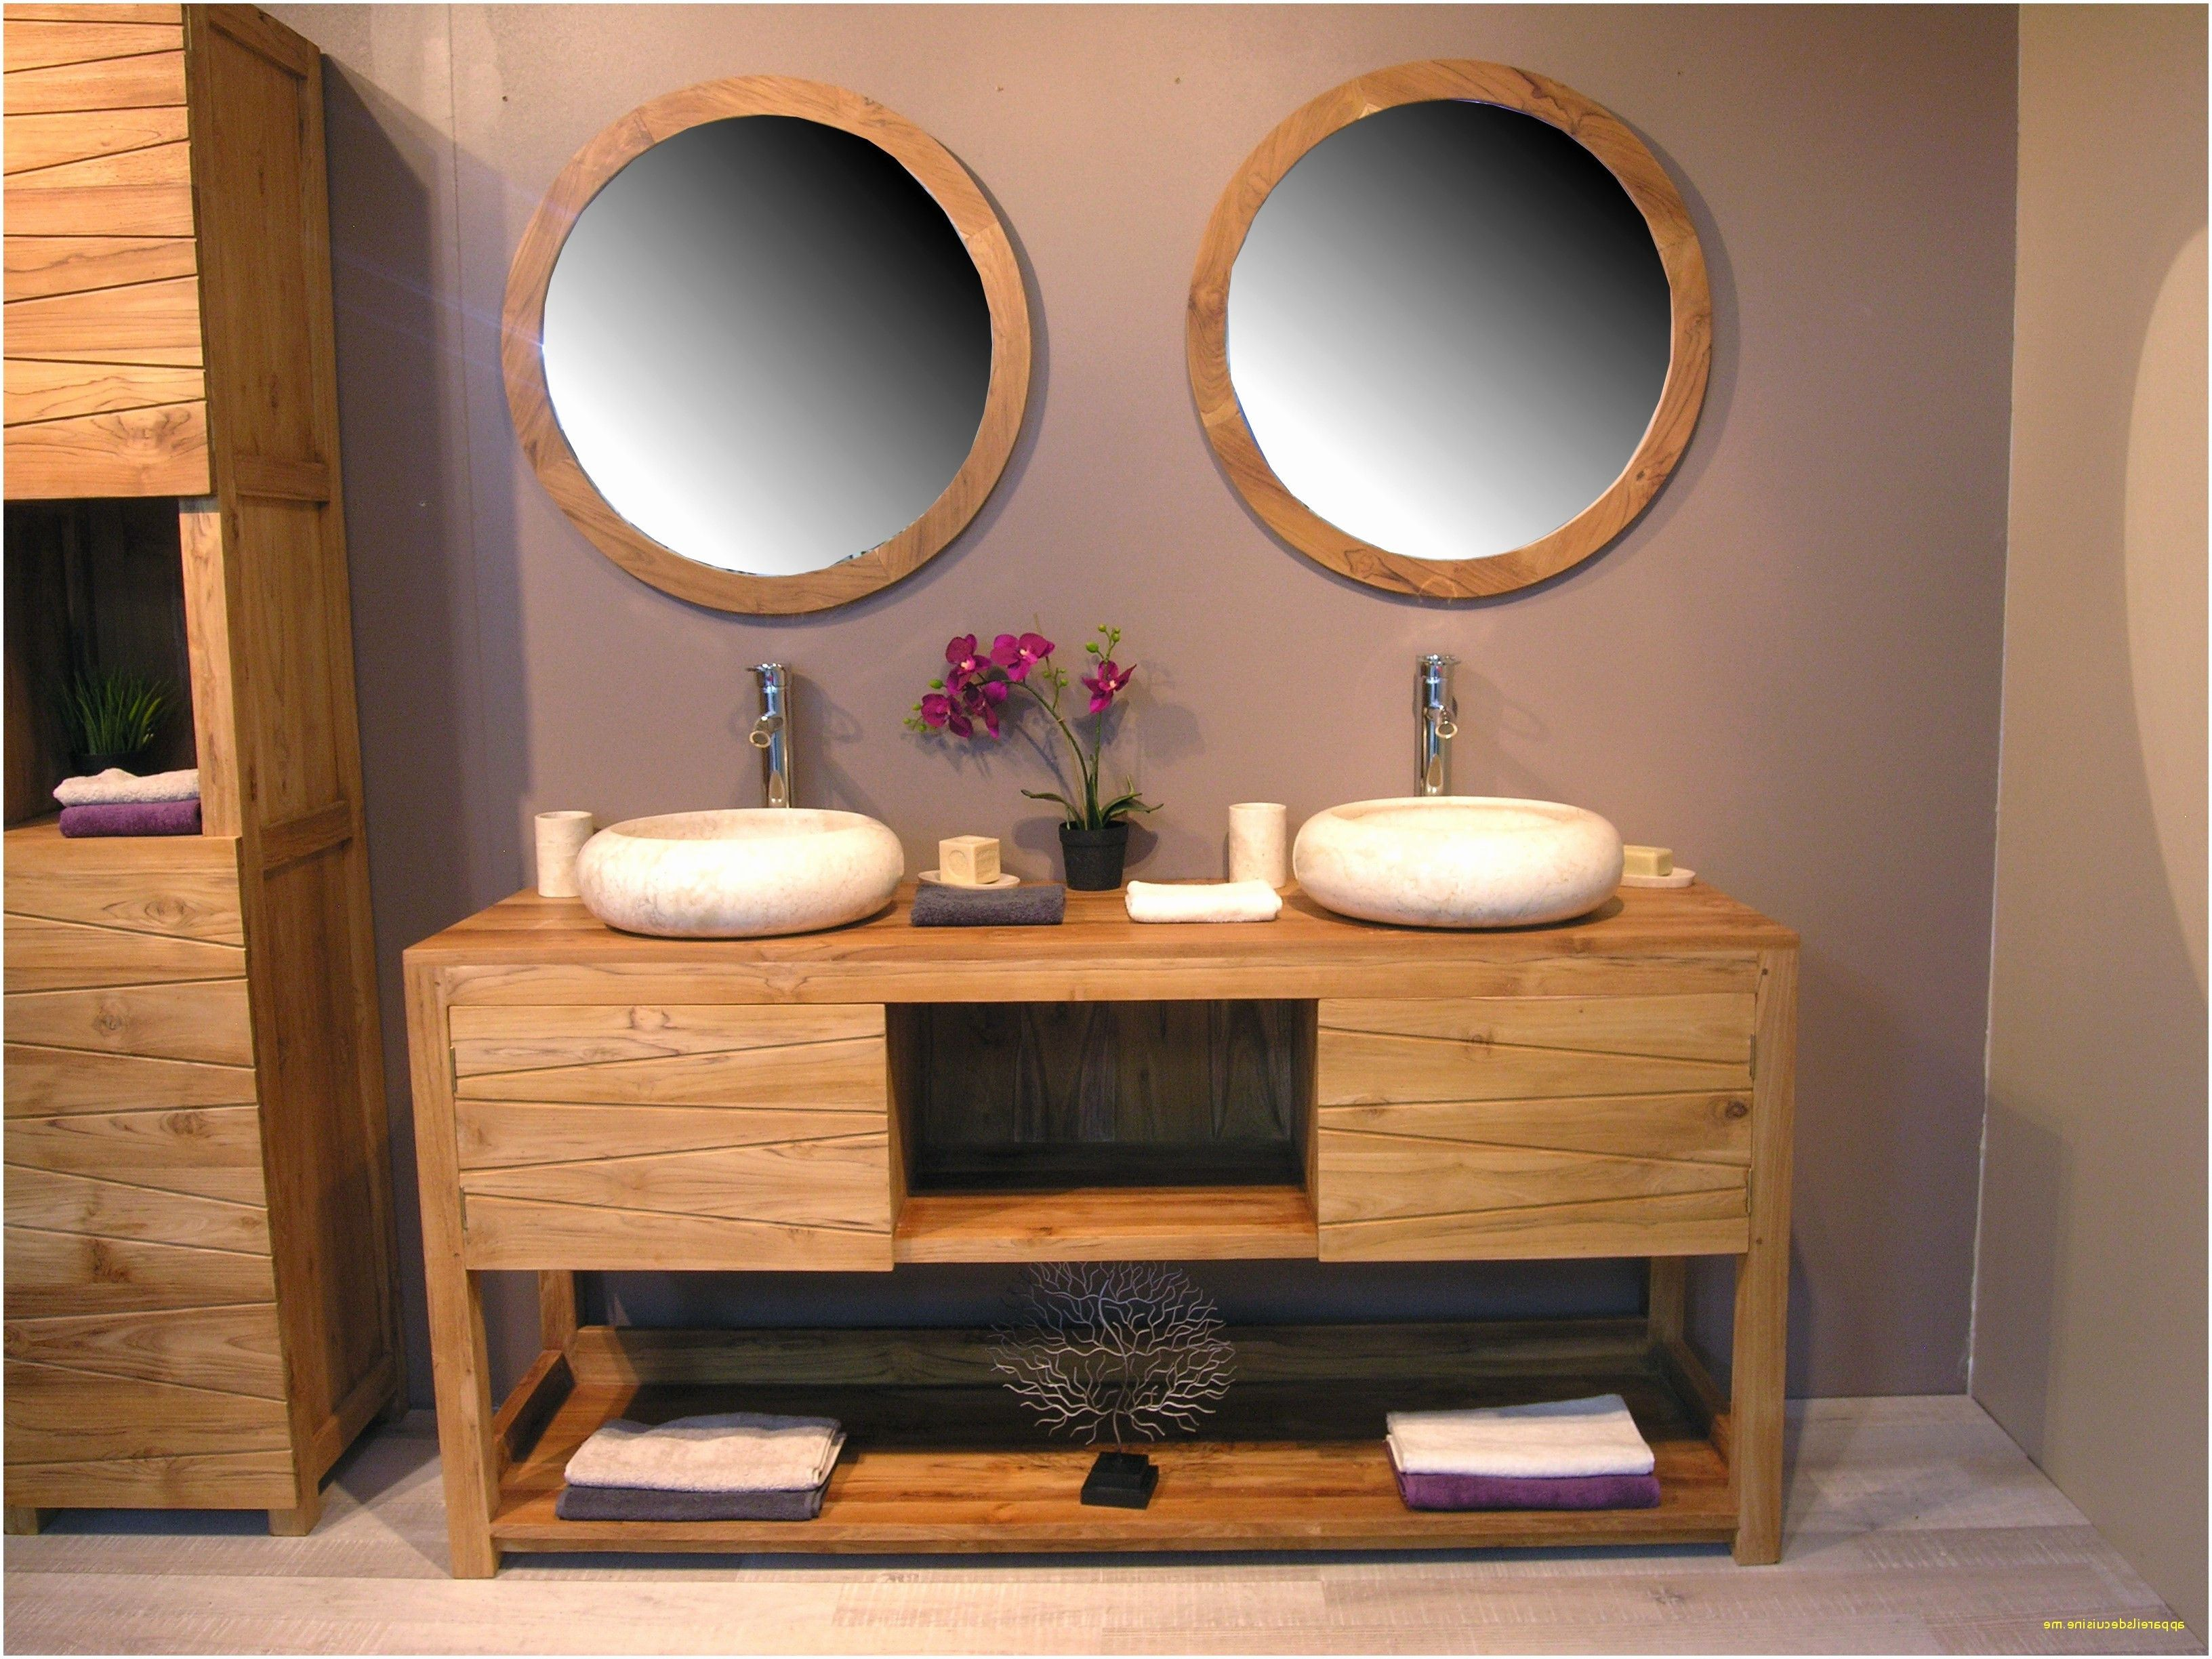 28 Inspirant Meuble Sous Vasque Teck Suggestions Dengan Gambar